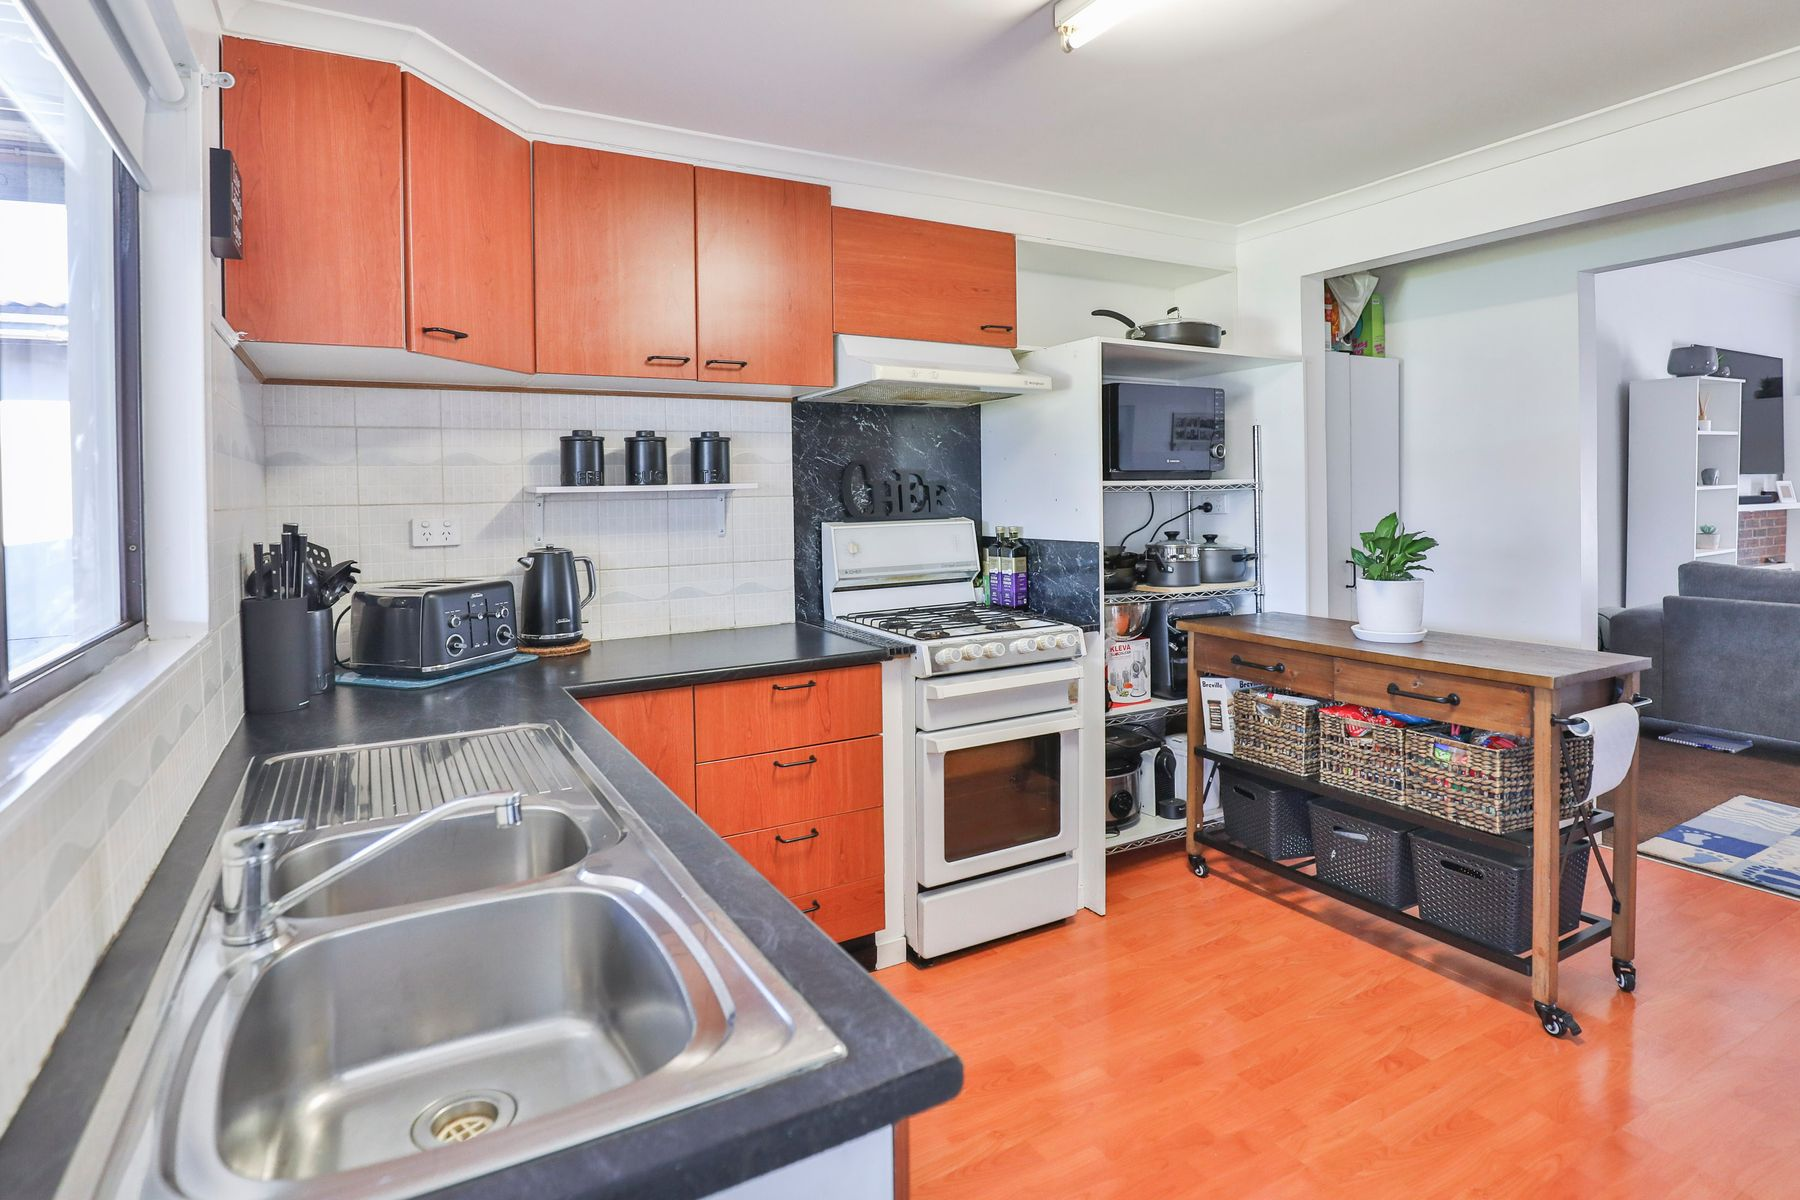 222 Beech Avenue, Mildura, VIC 3500